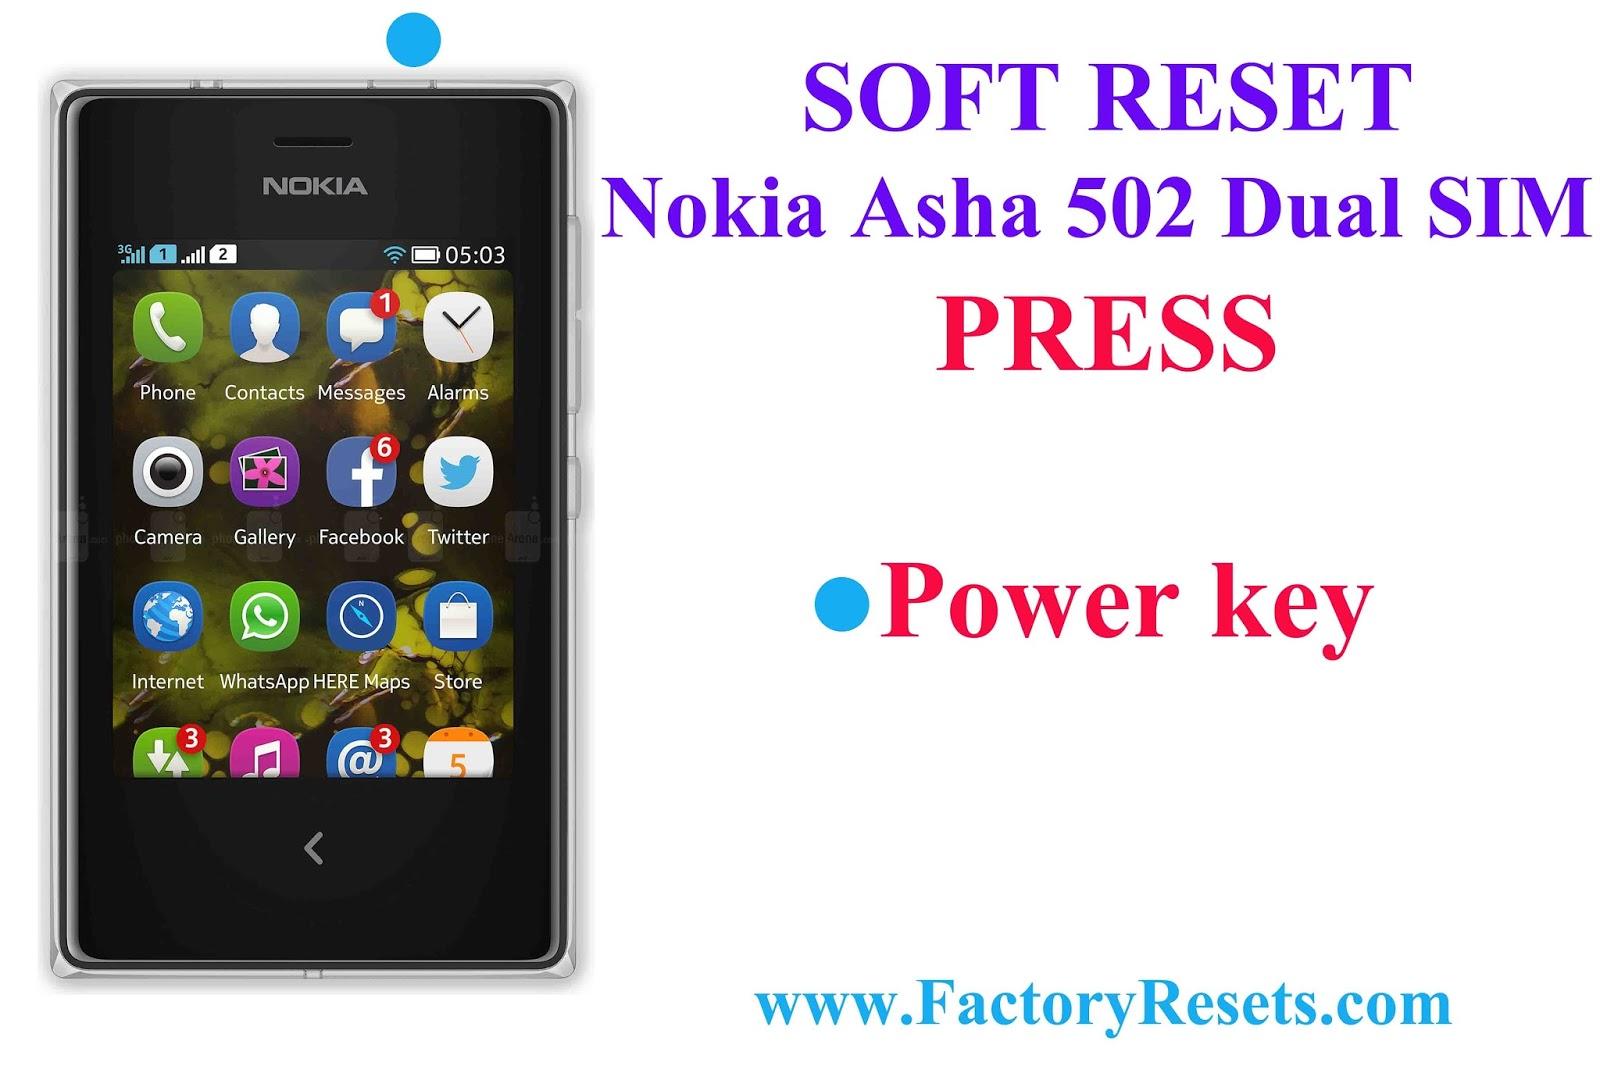 Facebook lite download for nokia asha 502